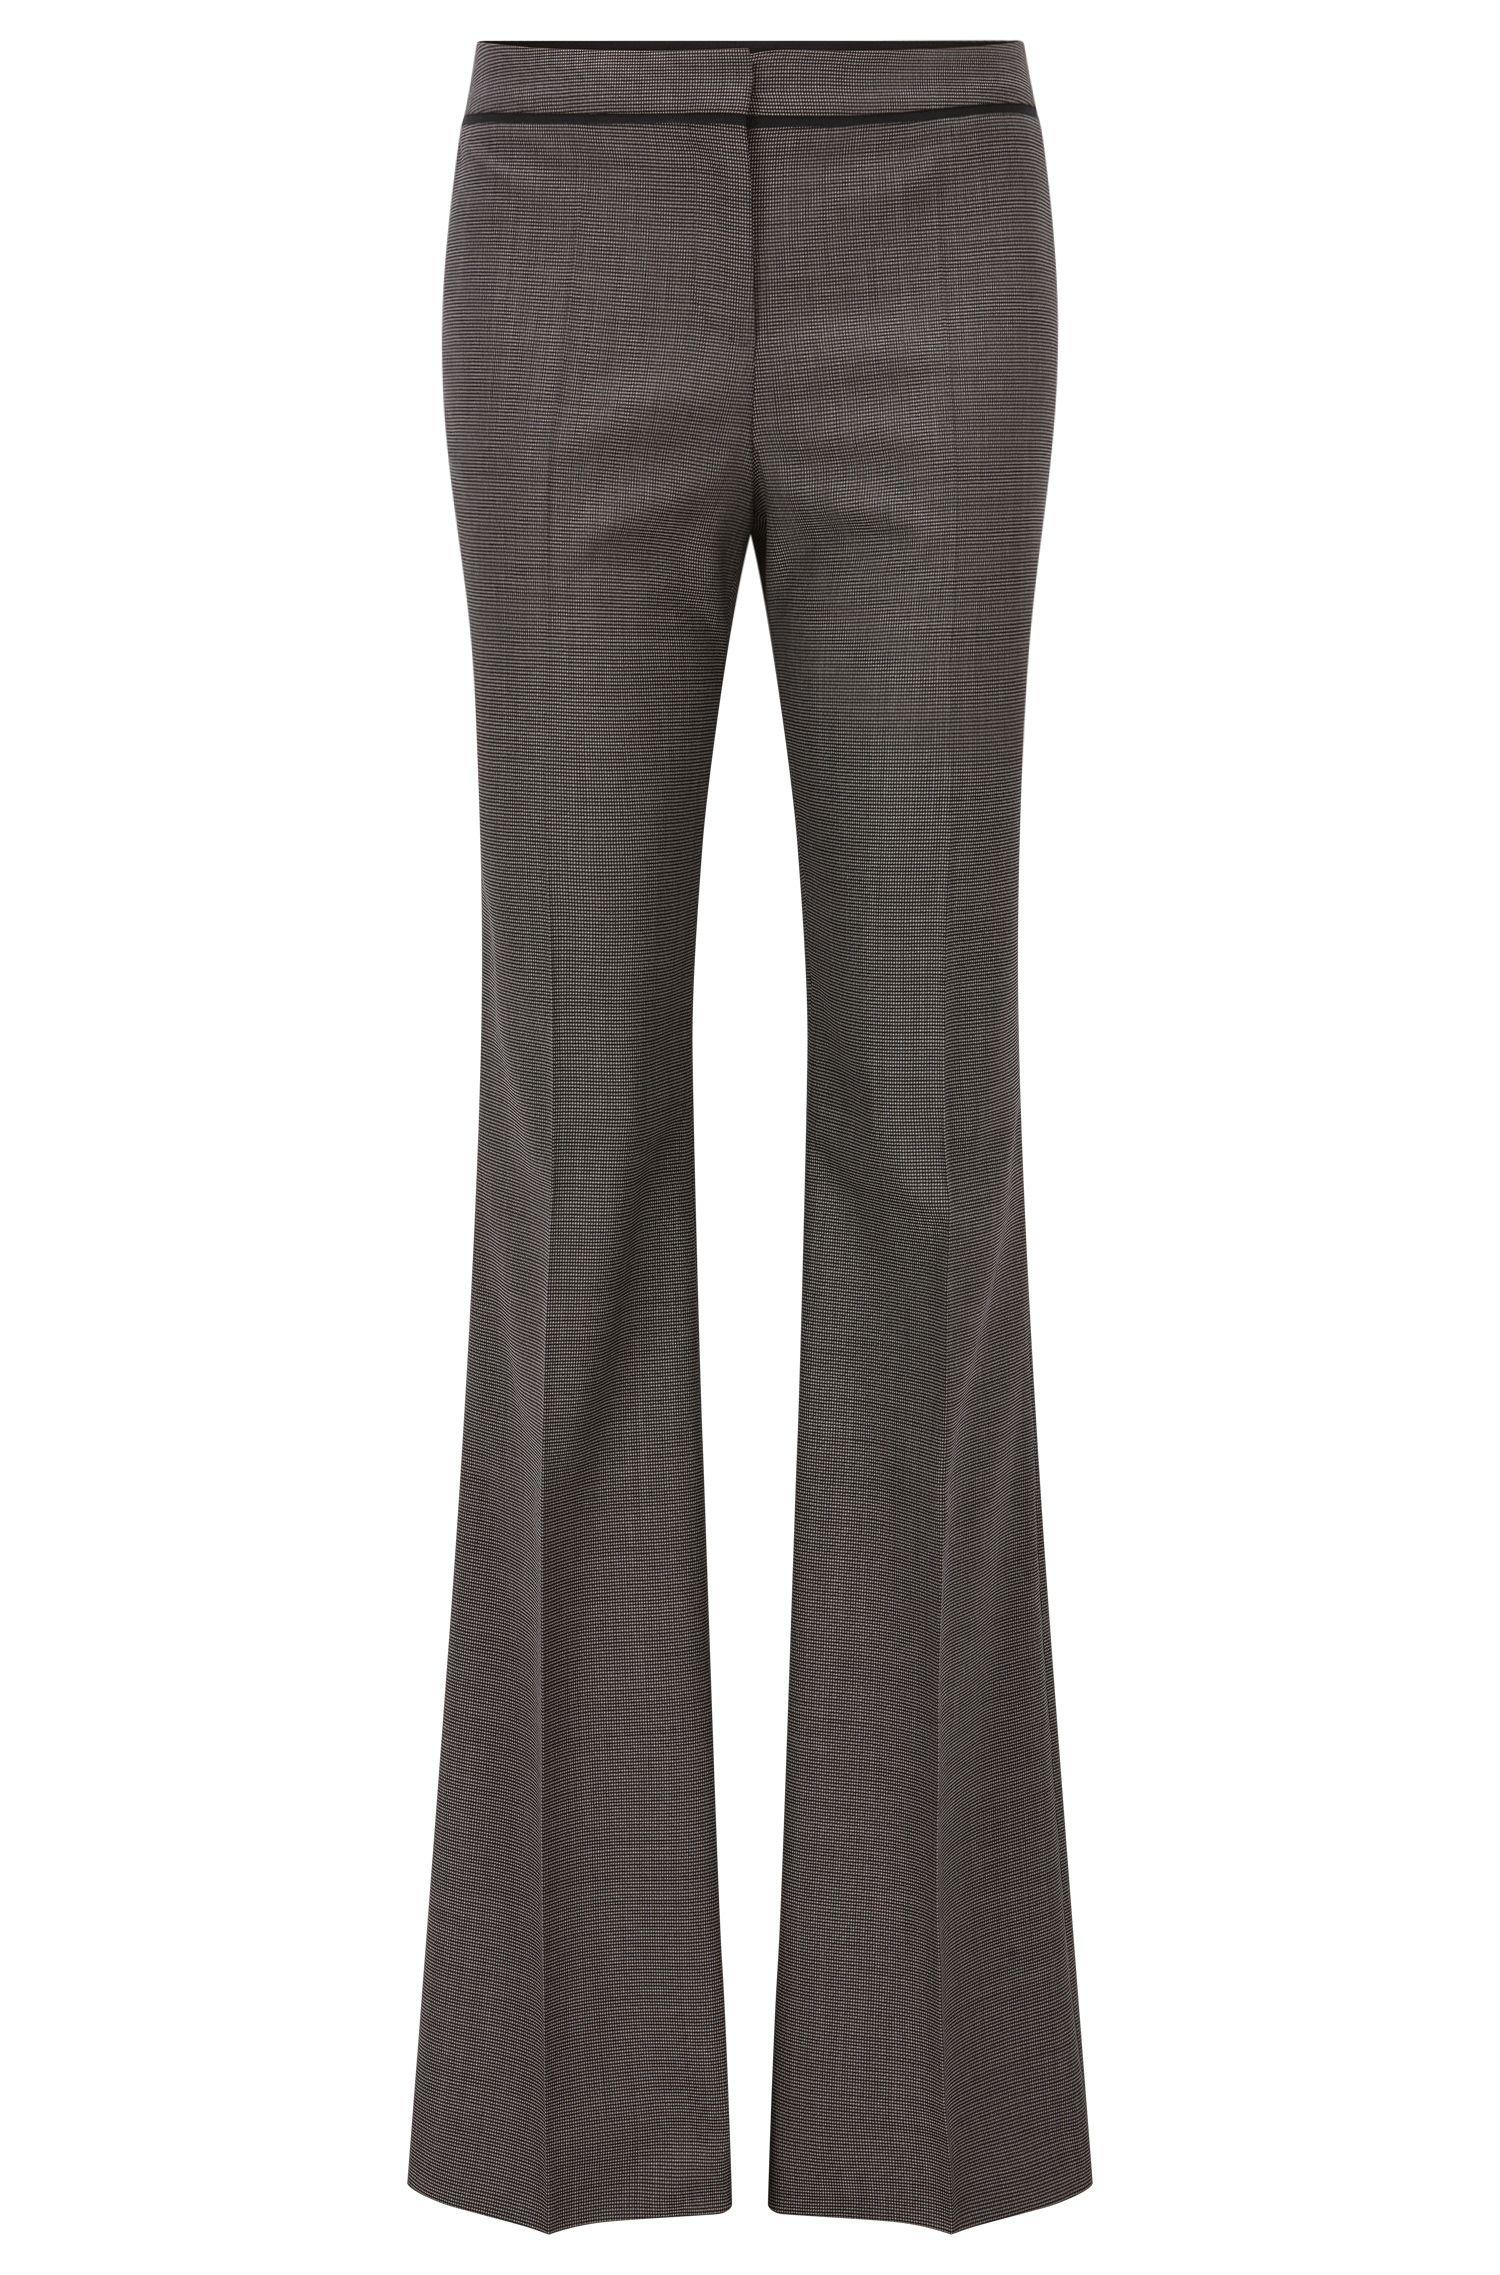 'Tulea' | Pindot Stretch Virgin Wool Pants